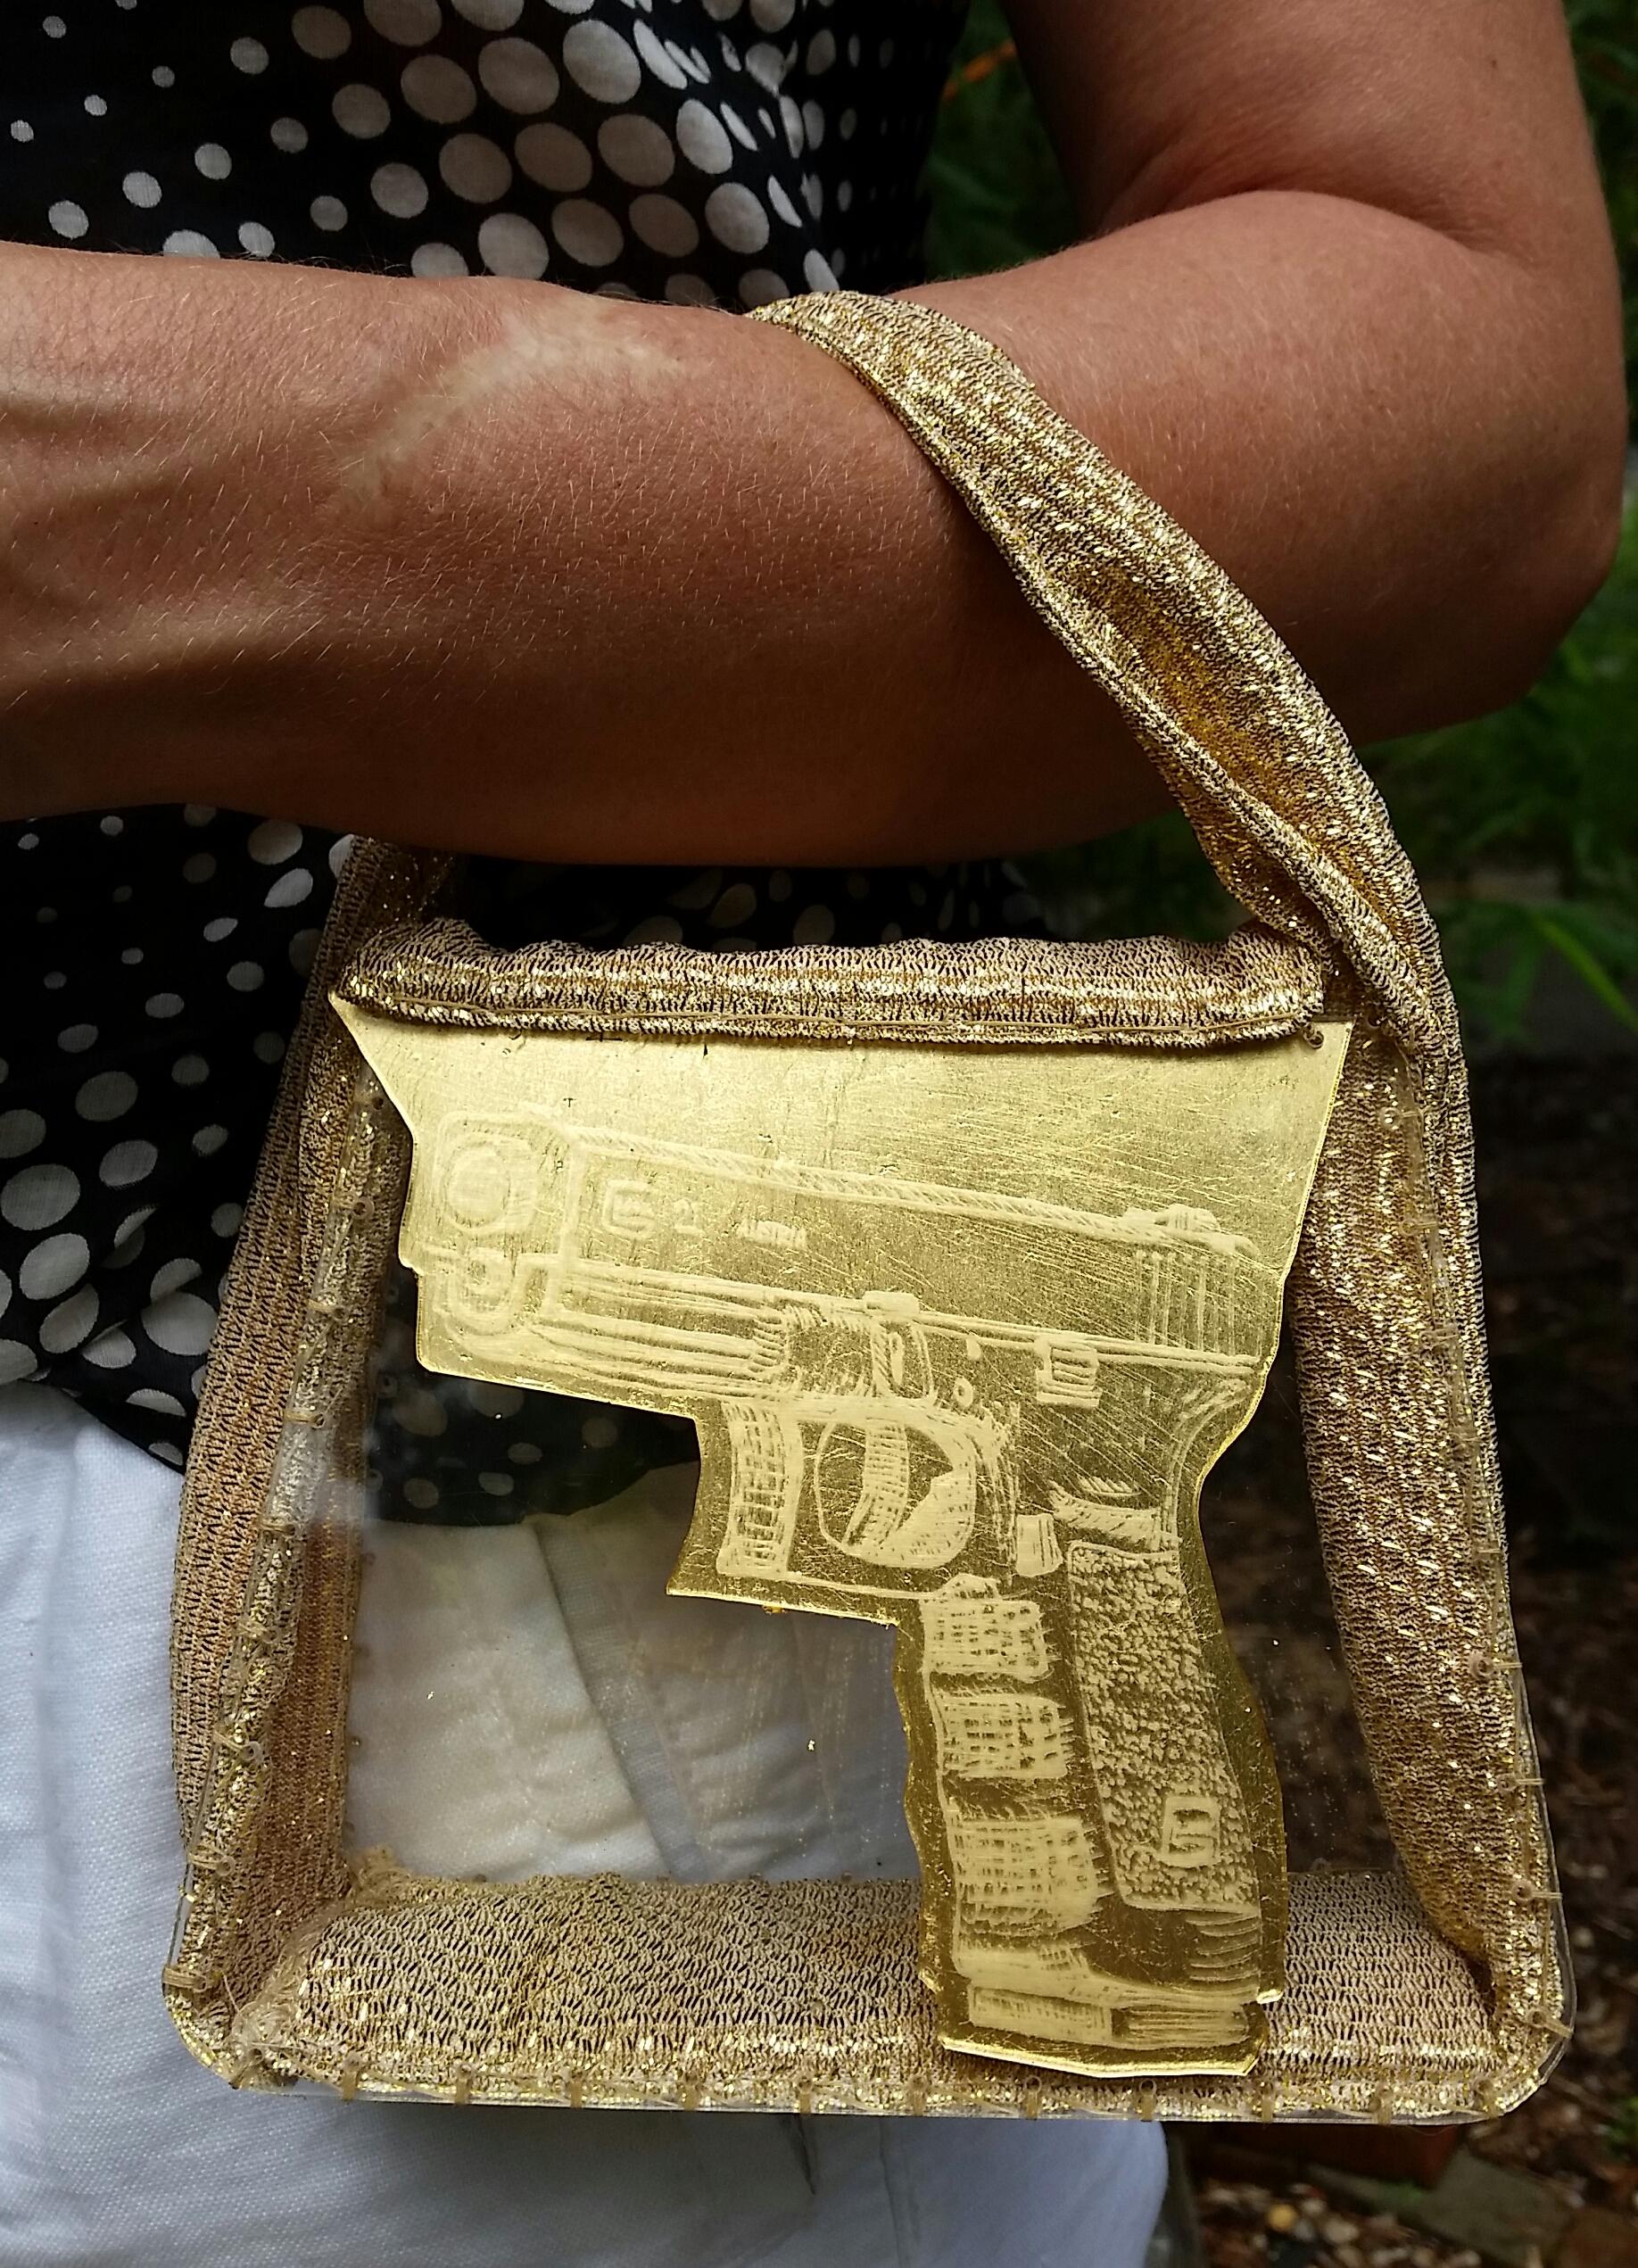 Review of 'The Gun Show':  https://rustbeltarts.com/author/kaletts/?blogsub=confirming#blog_subscription-2